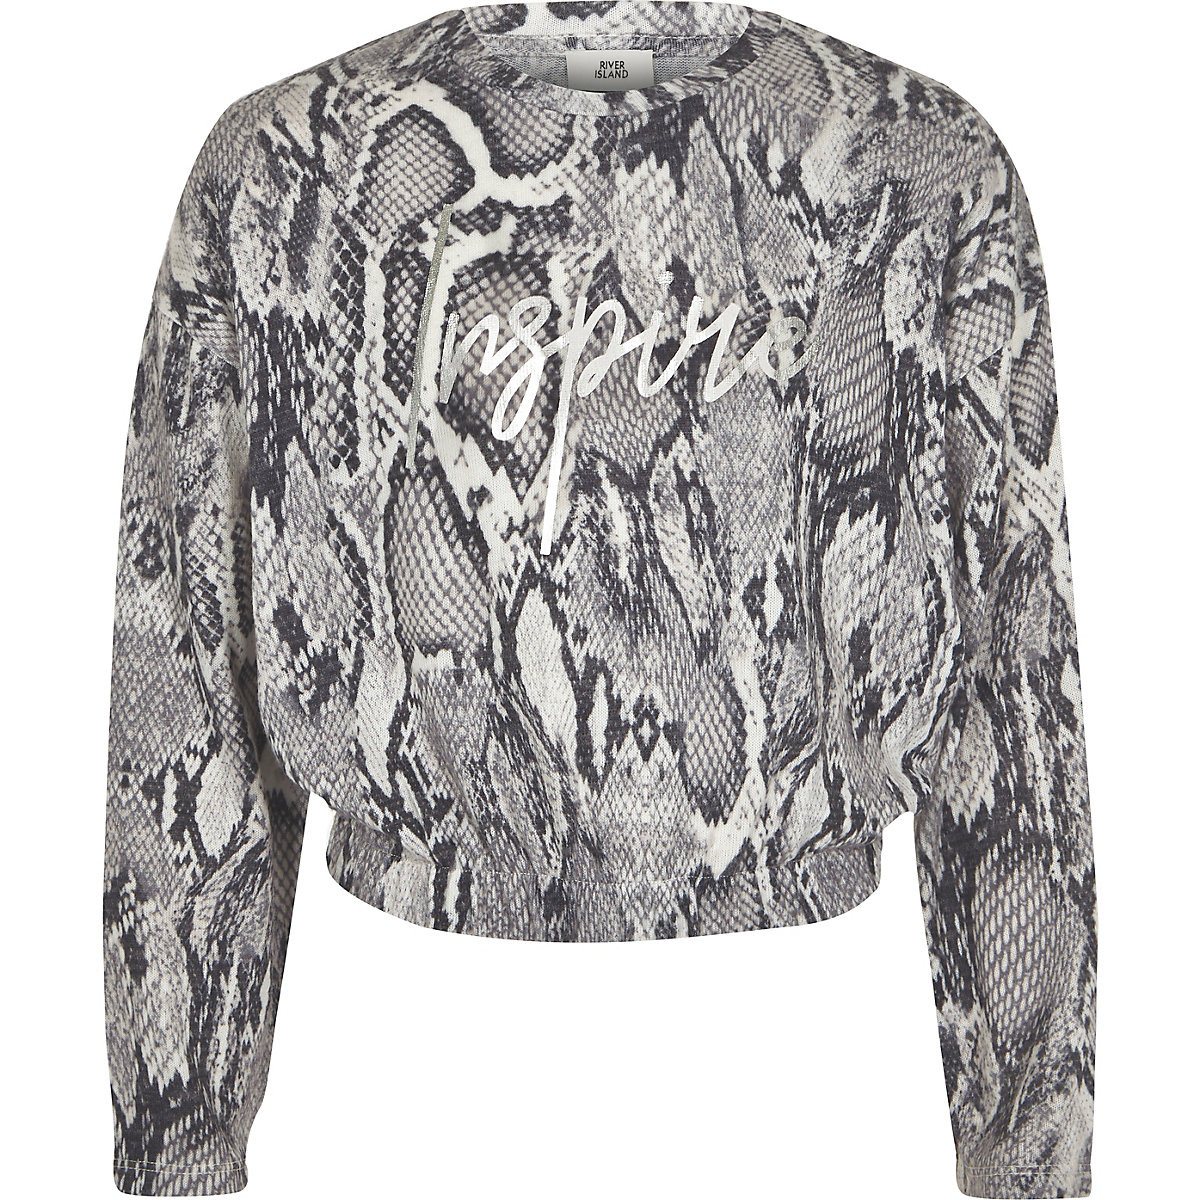 Girls grey snake print 'Inspire' sweatshirt